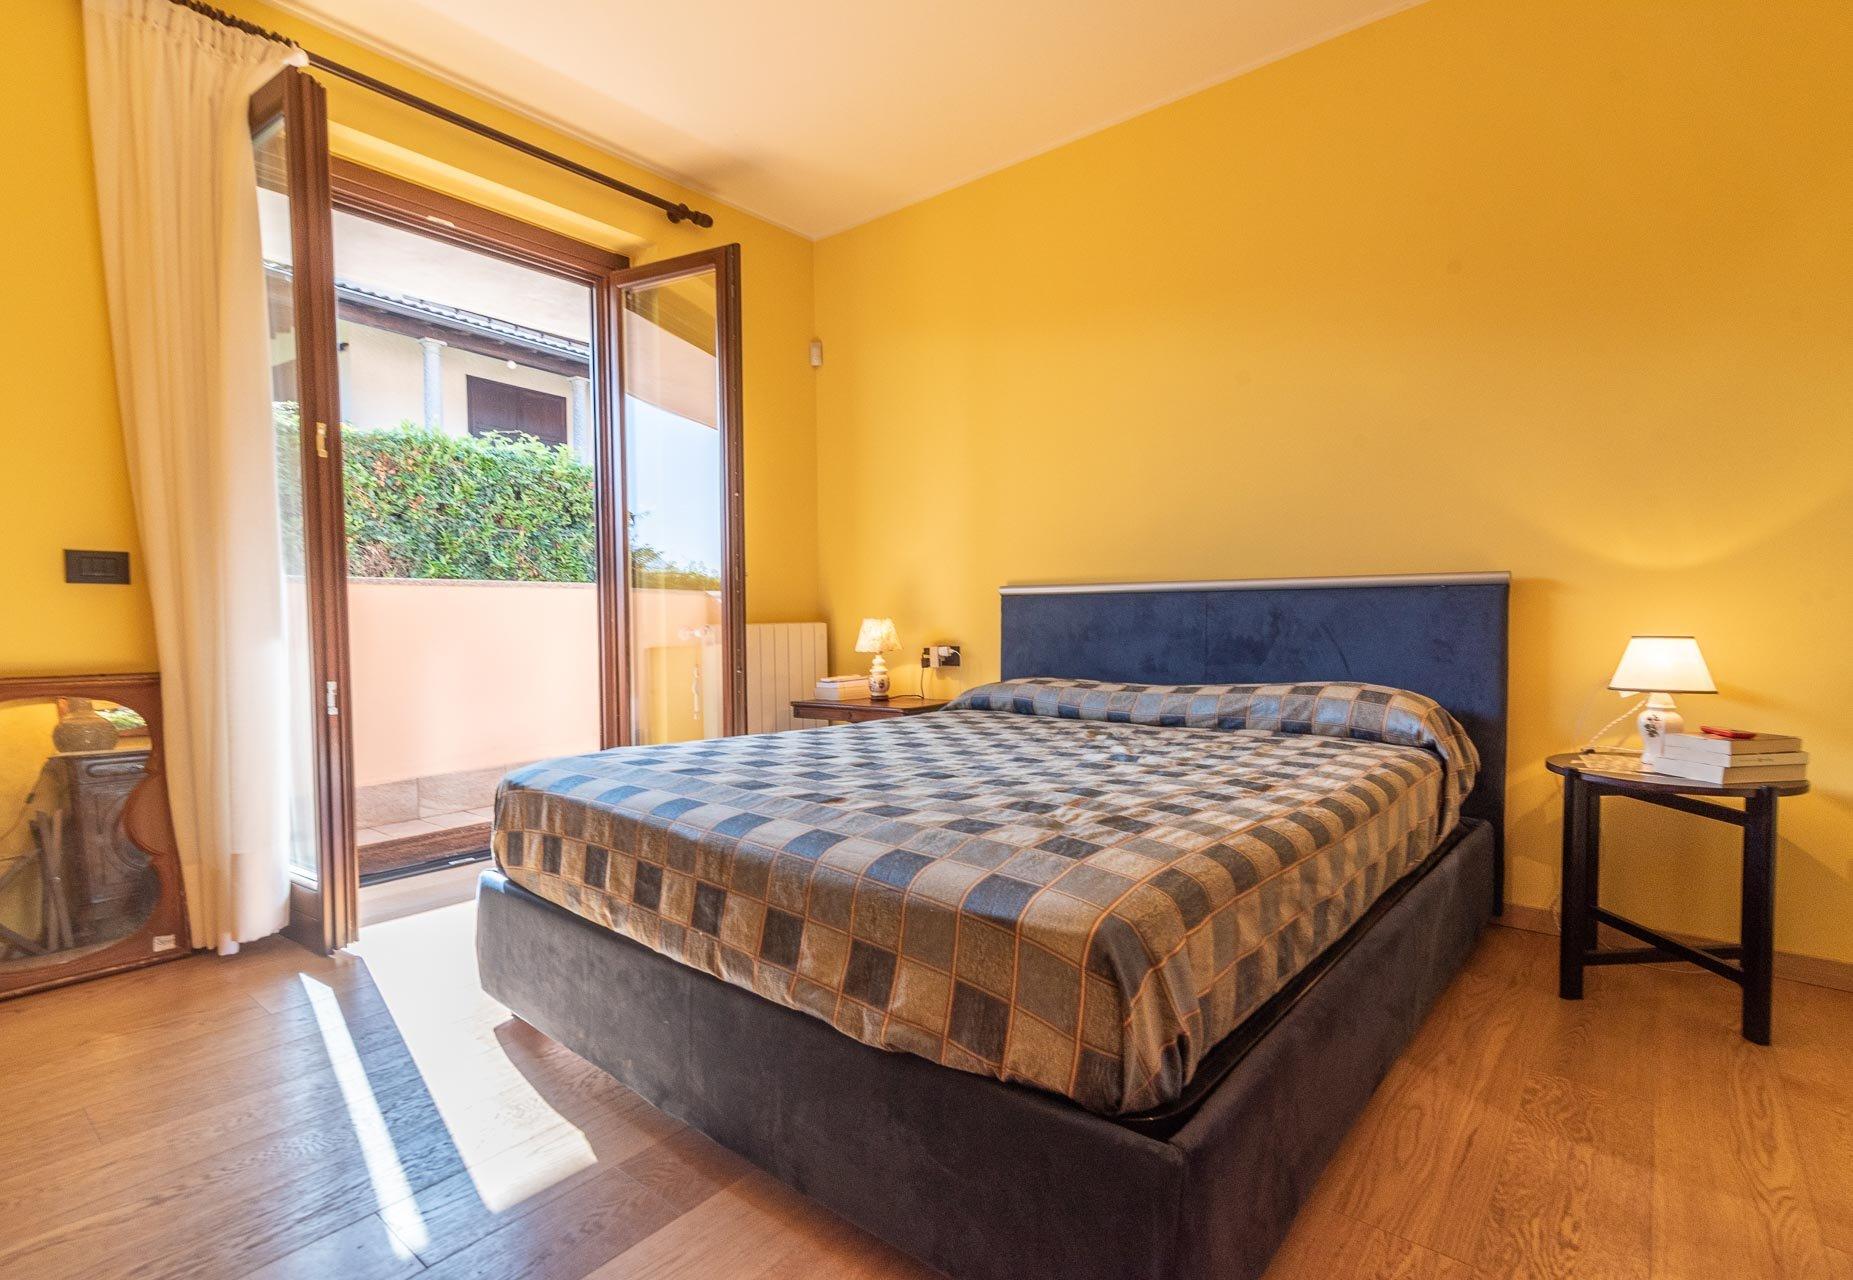 Semi-detached house for sale in Stresa - master bedroom